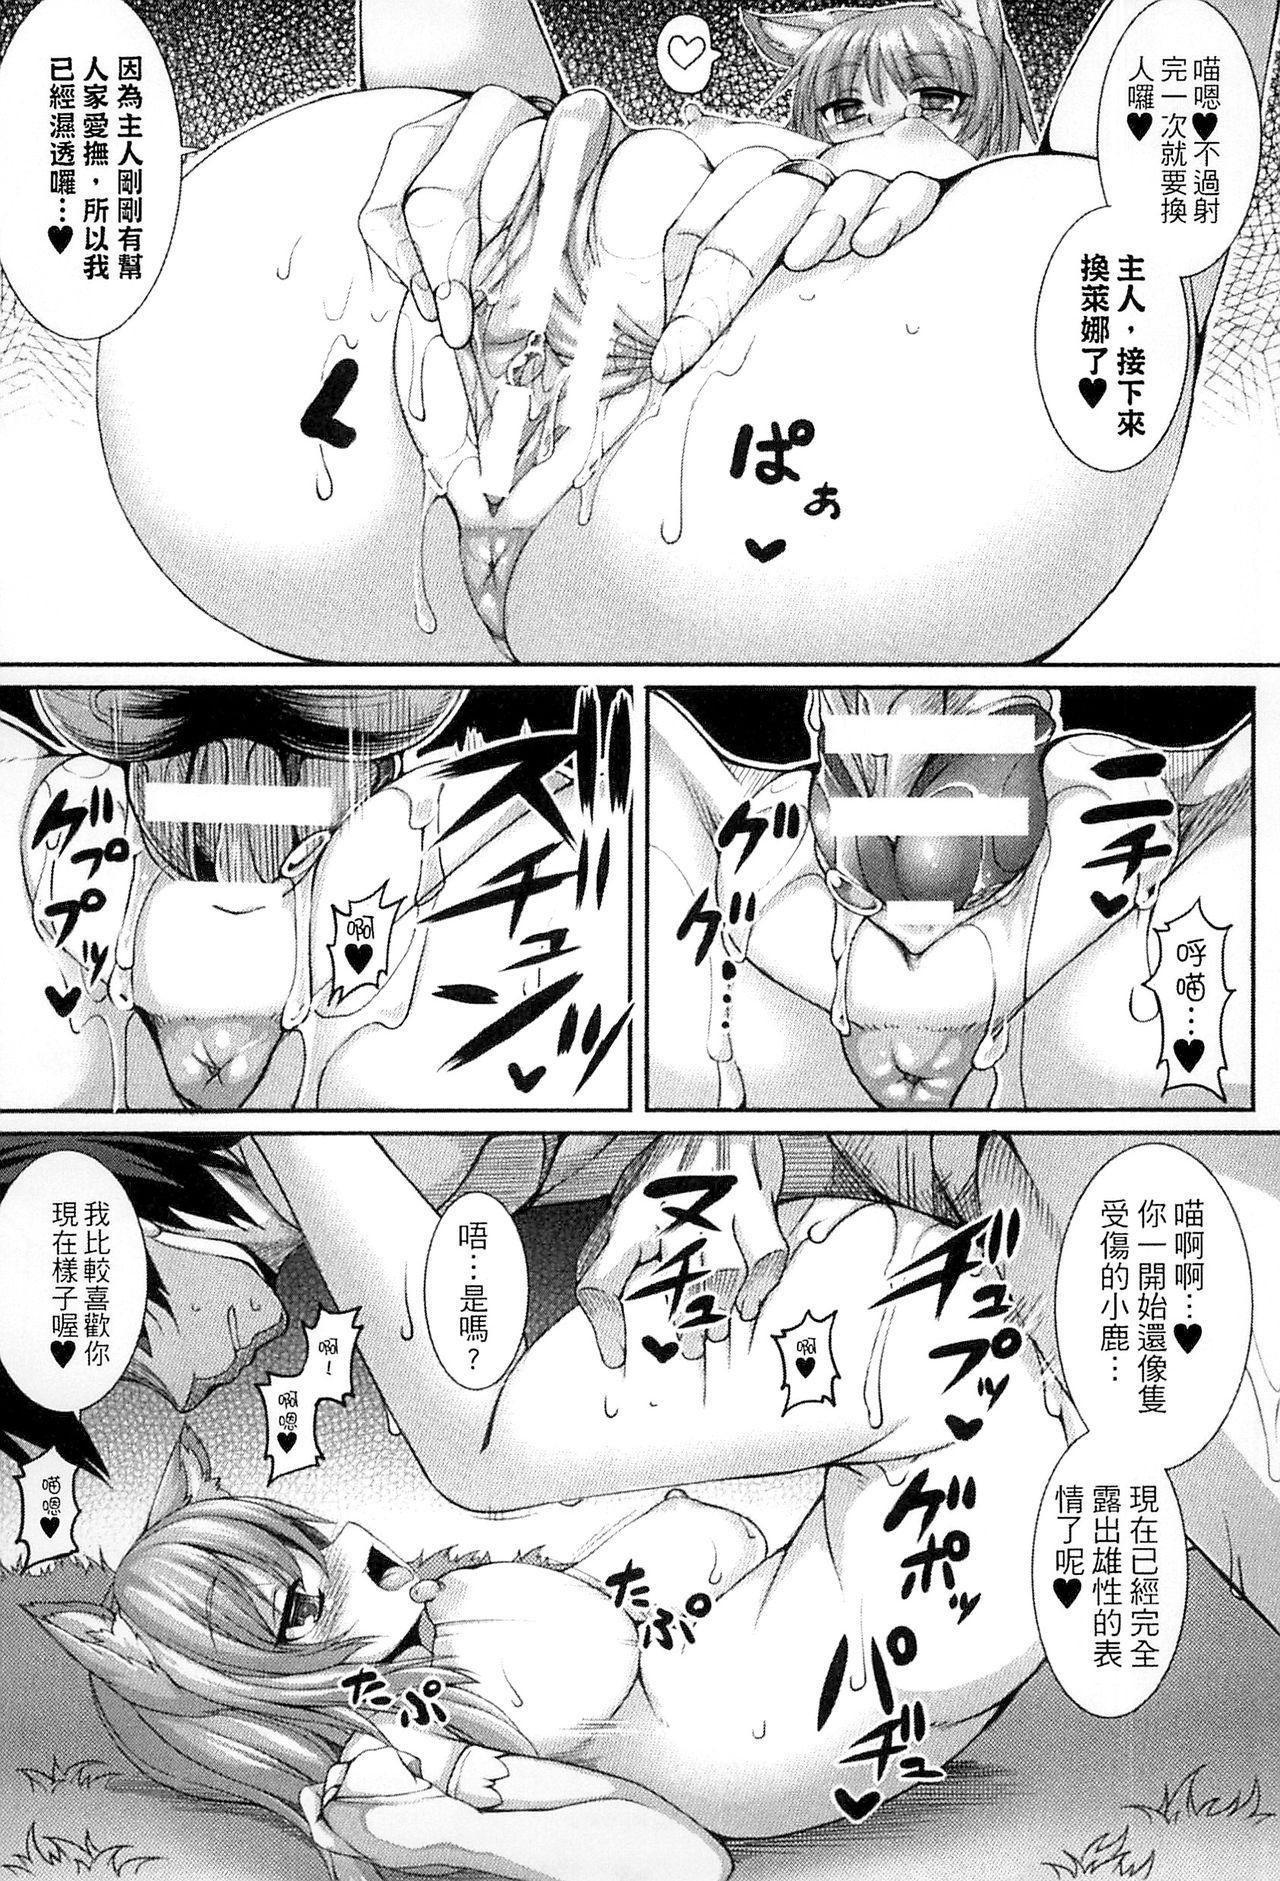 [Takayuki Hiyori] Aiyoku Gensou no Kai ~Cthulhu Pregnant~   愛欲幻想之怪 -克蘇魯- [Chinese] 97